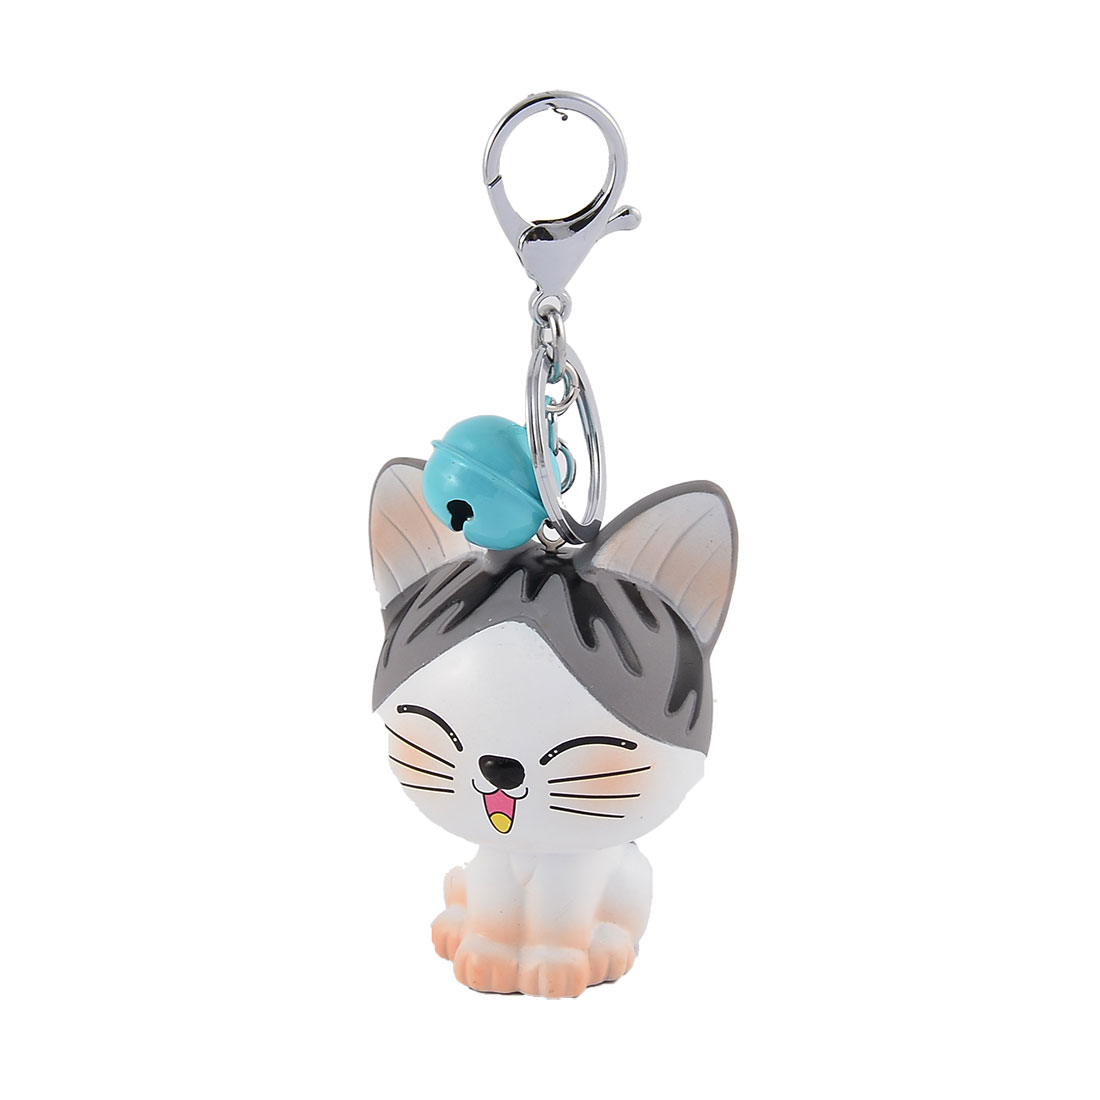 Purse Bags Rubber Pendant Decoration Keychain Key Holder Split Ring Keyring